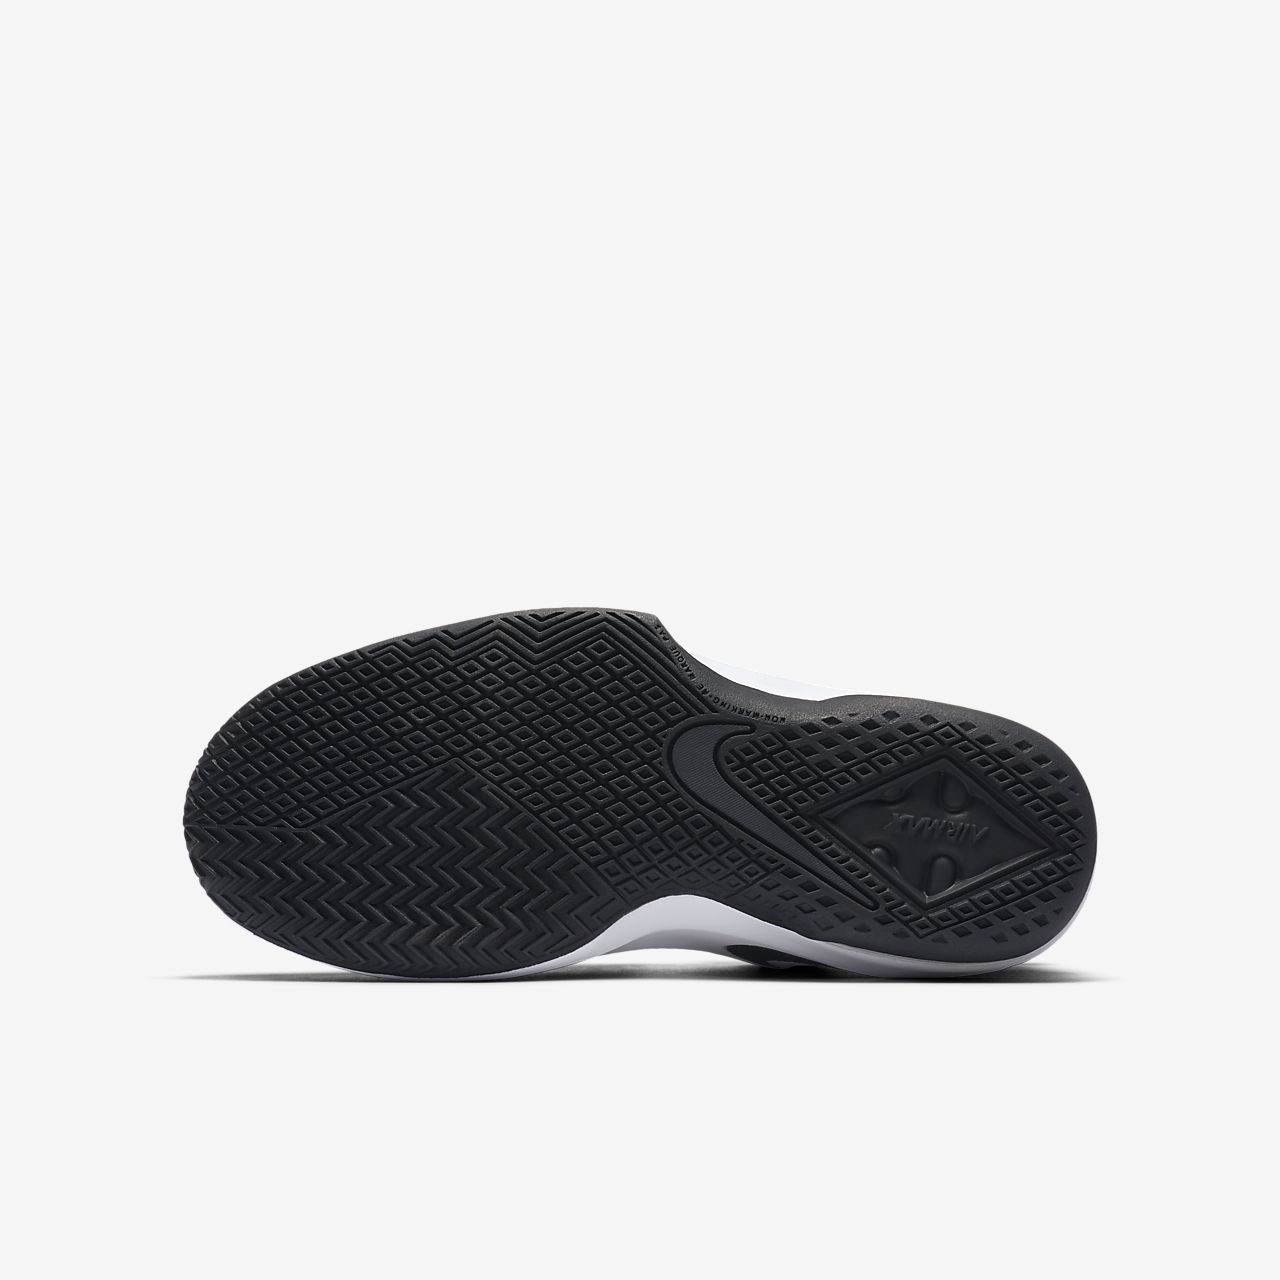 9ae1da273fe ... Nike Air Max Infuriate II Mid Zapatillas de baloncesto - Niño a y niño a